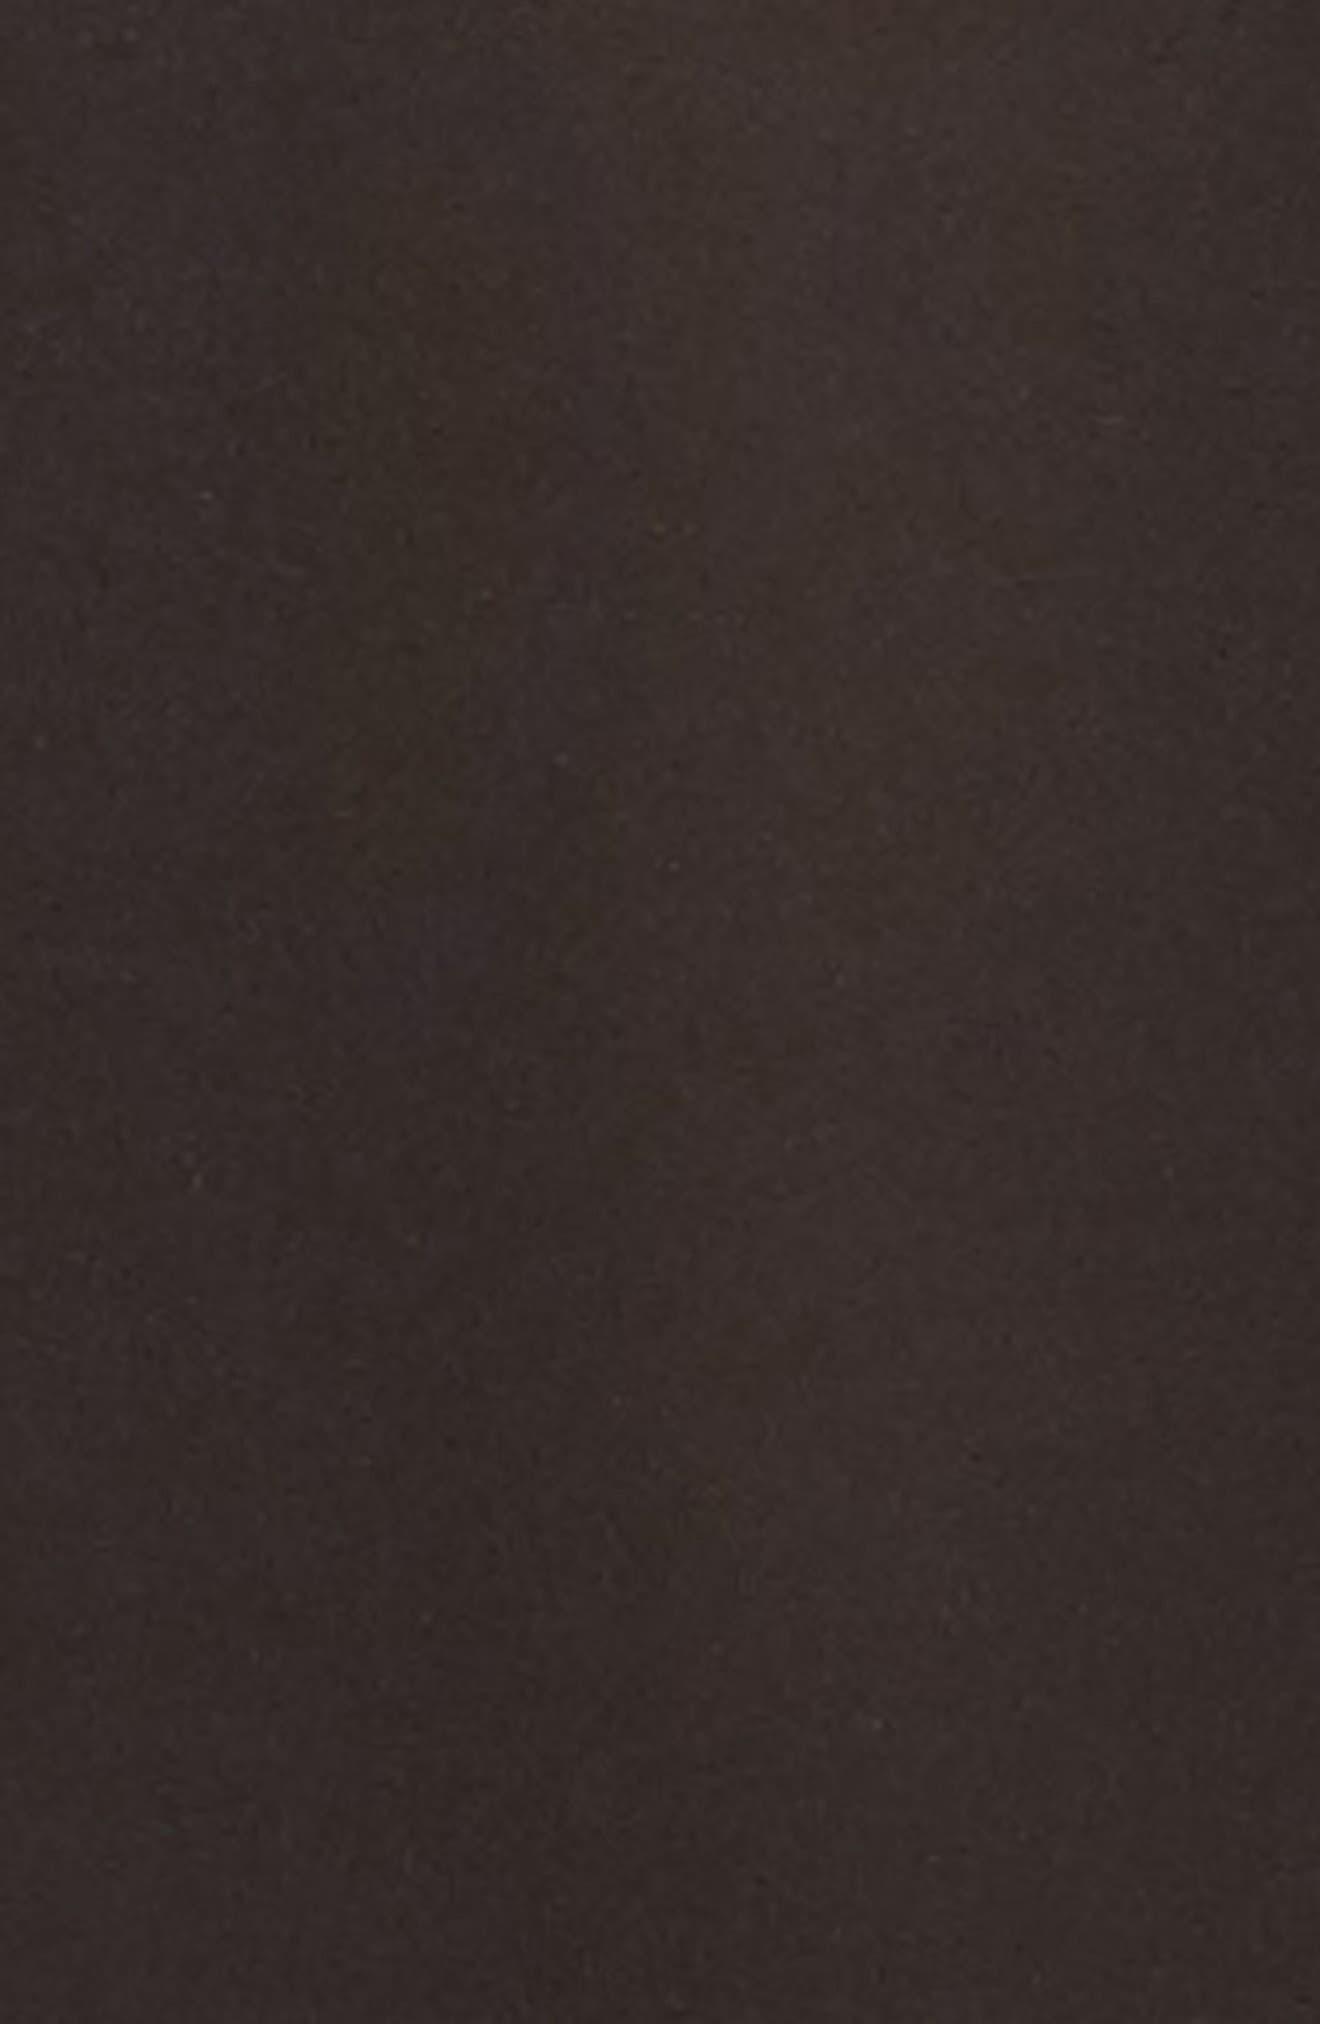 Customized Stretch Boxer Briefs,                             Alternate thumbnail 4, color,                             Black/ W Rebel Wb